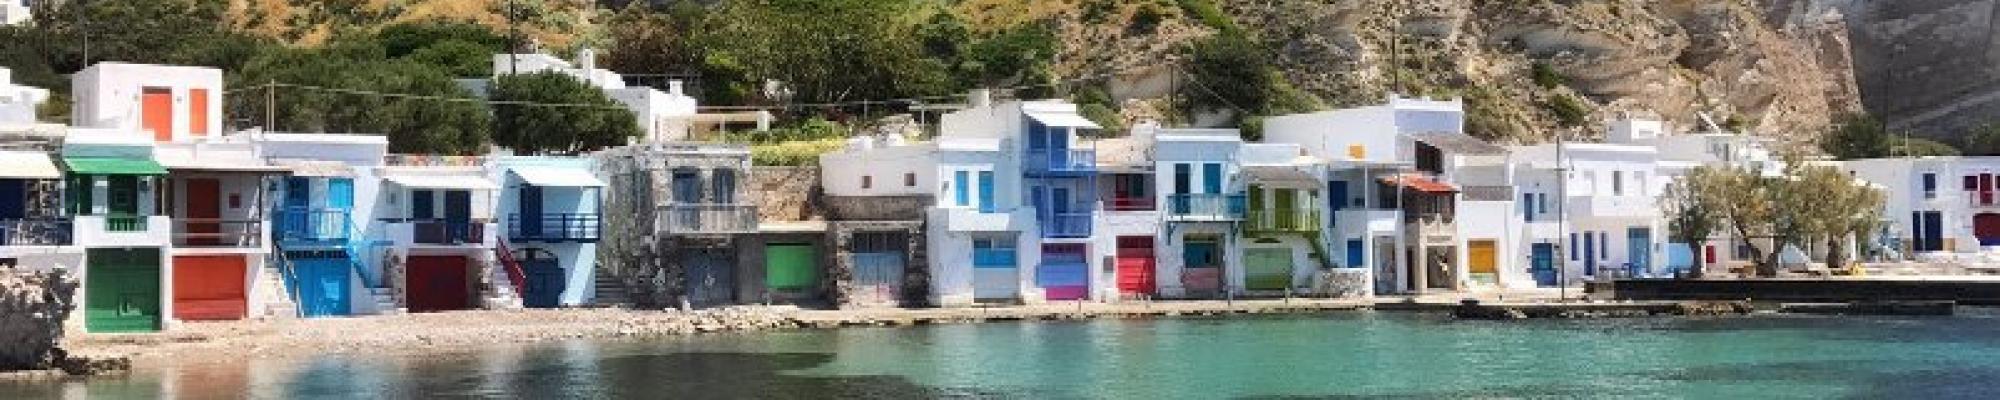 Voyage Cyclades Grèce